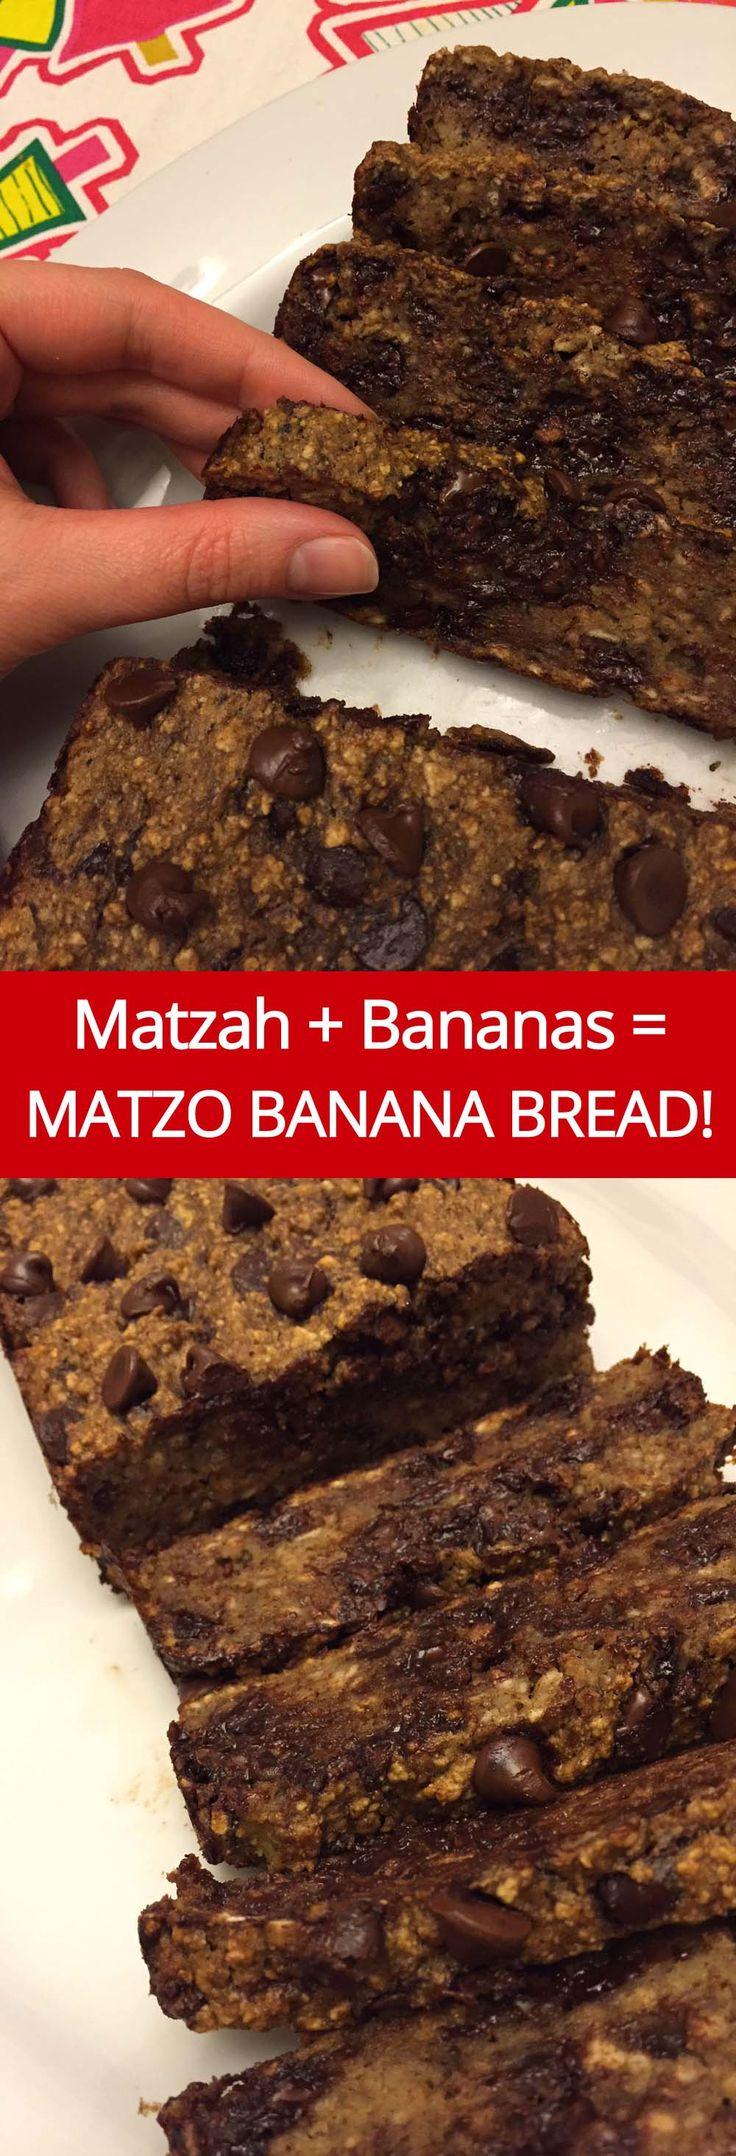 Matzo Meal Banana Bread Recipe from MelanieCooks.com - Perfect For Passover!